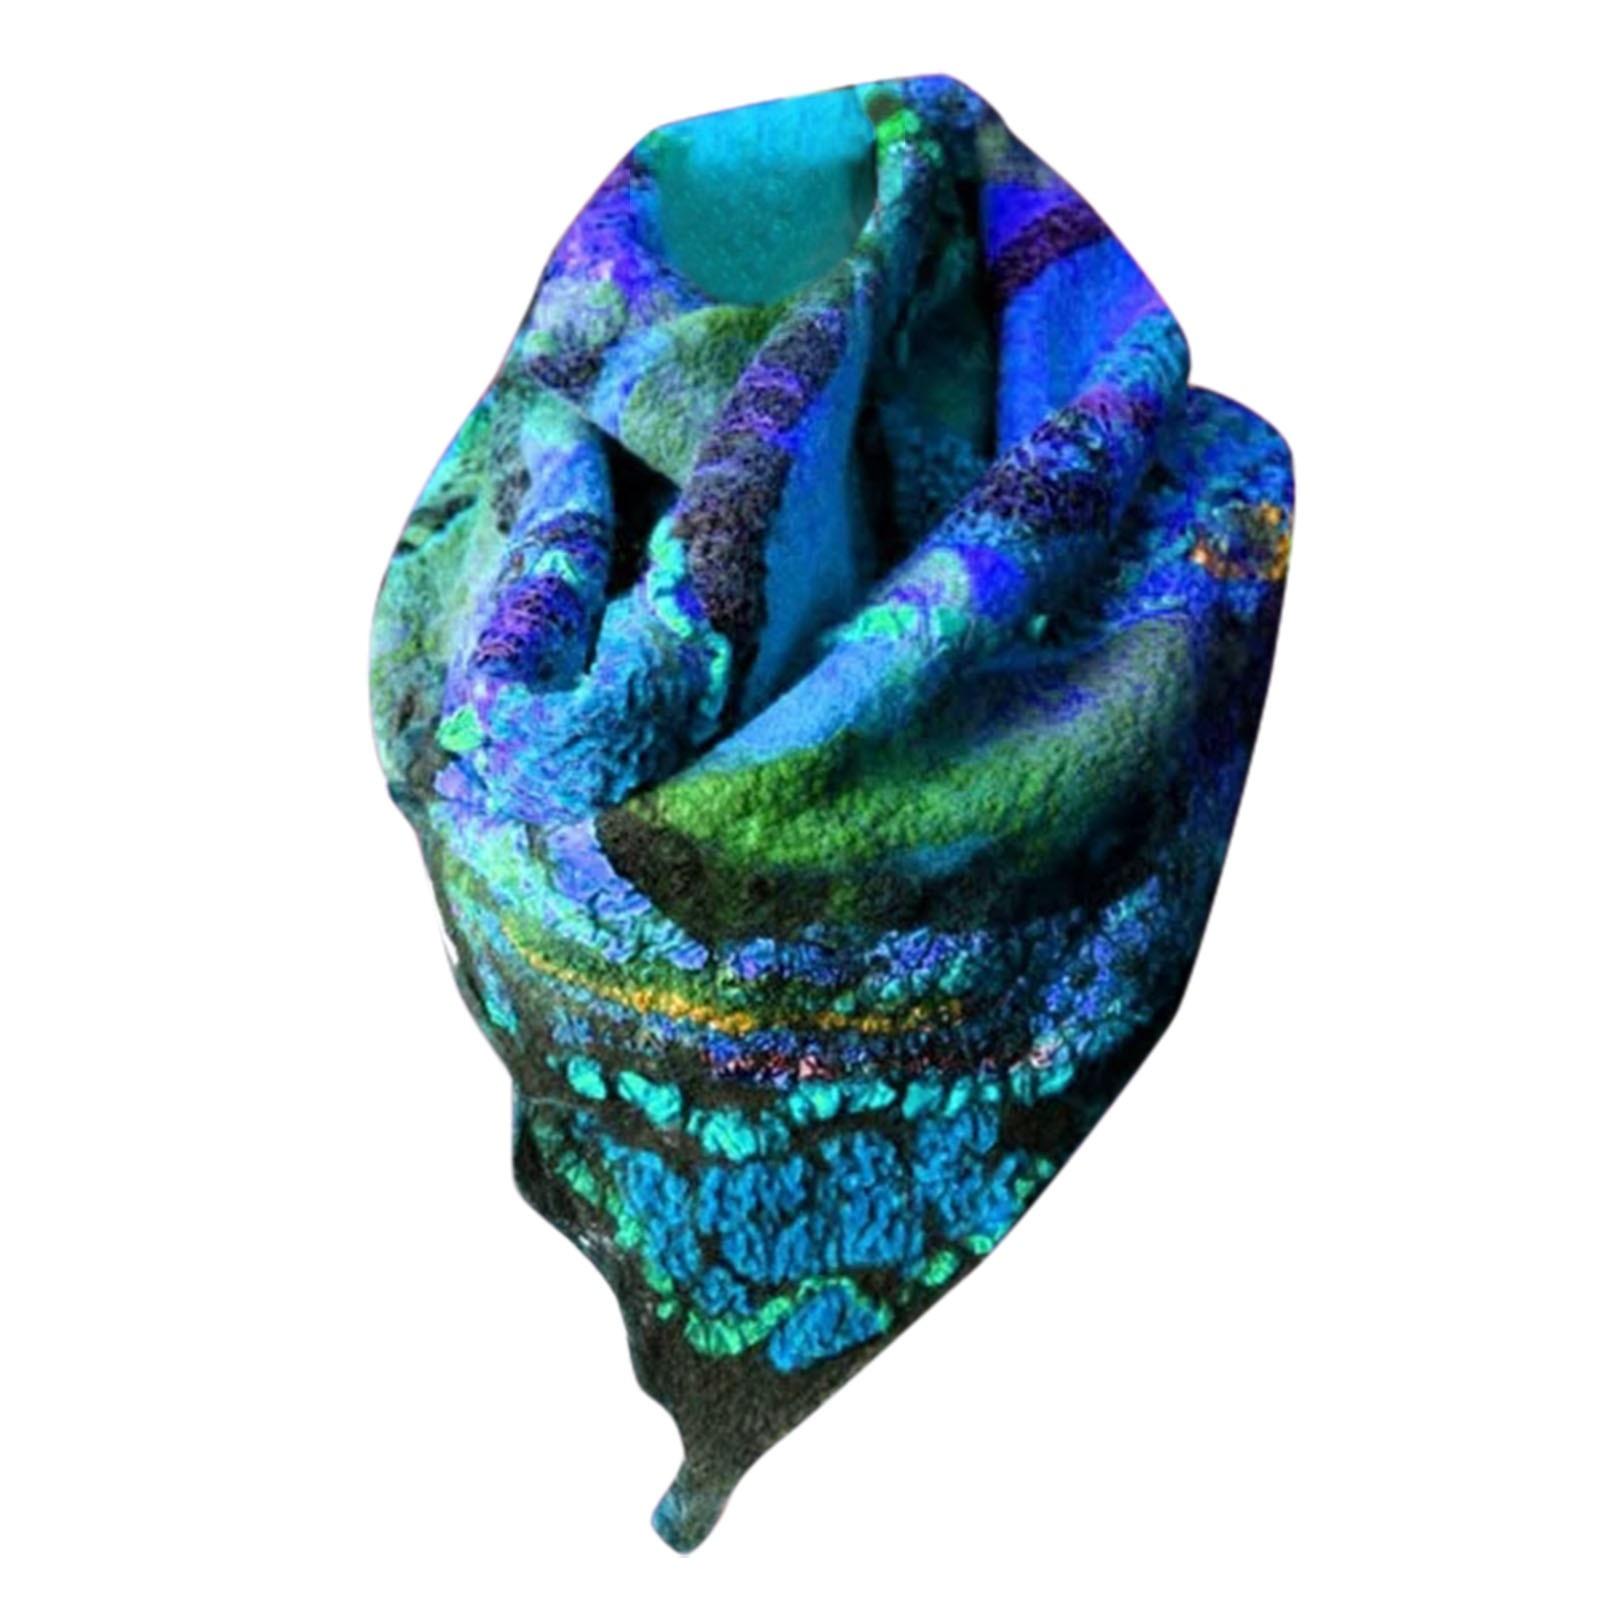 D 2020 Fashion Winter Scarf For Women Fashion Retro Printing Button Soft Wrap Casual Warm Scarves Shawls Scarf шарф женский